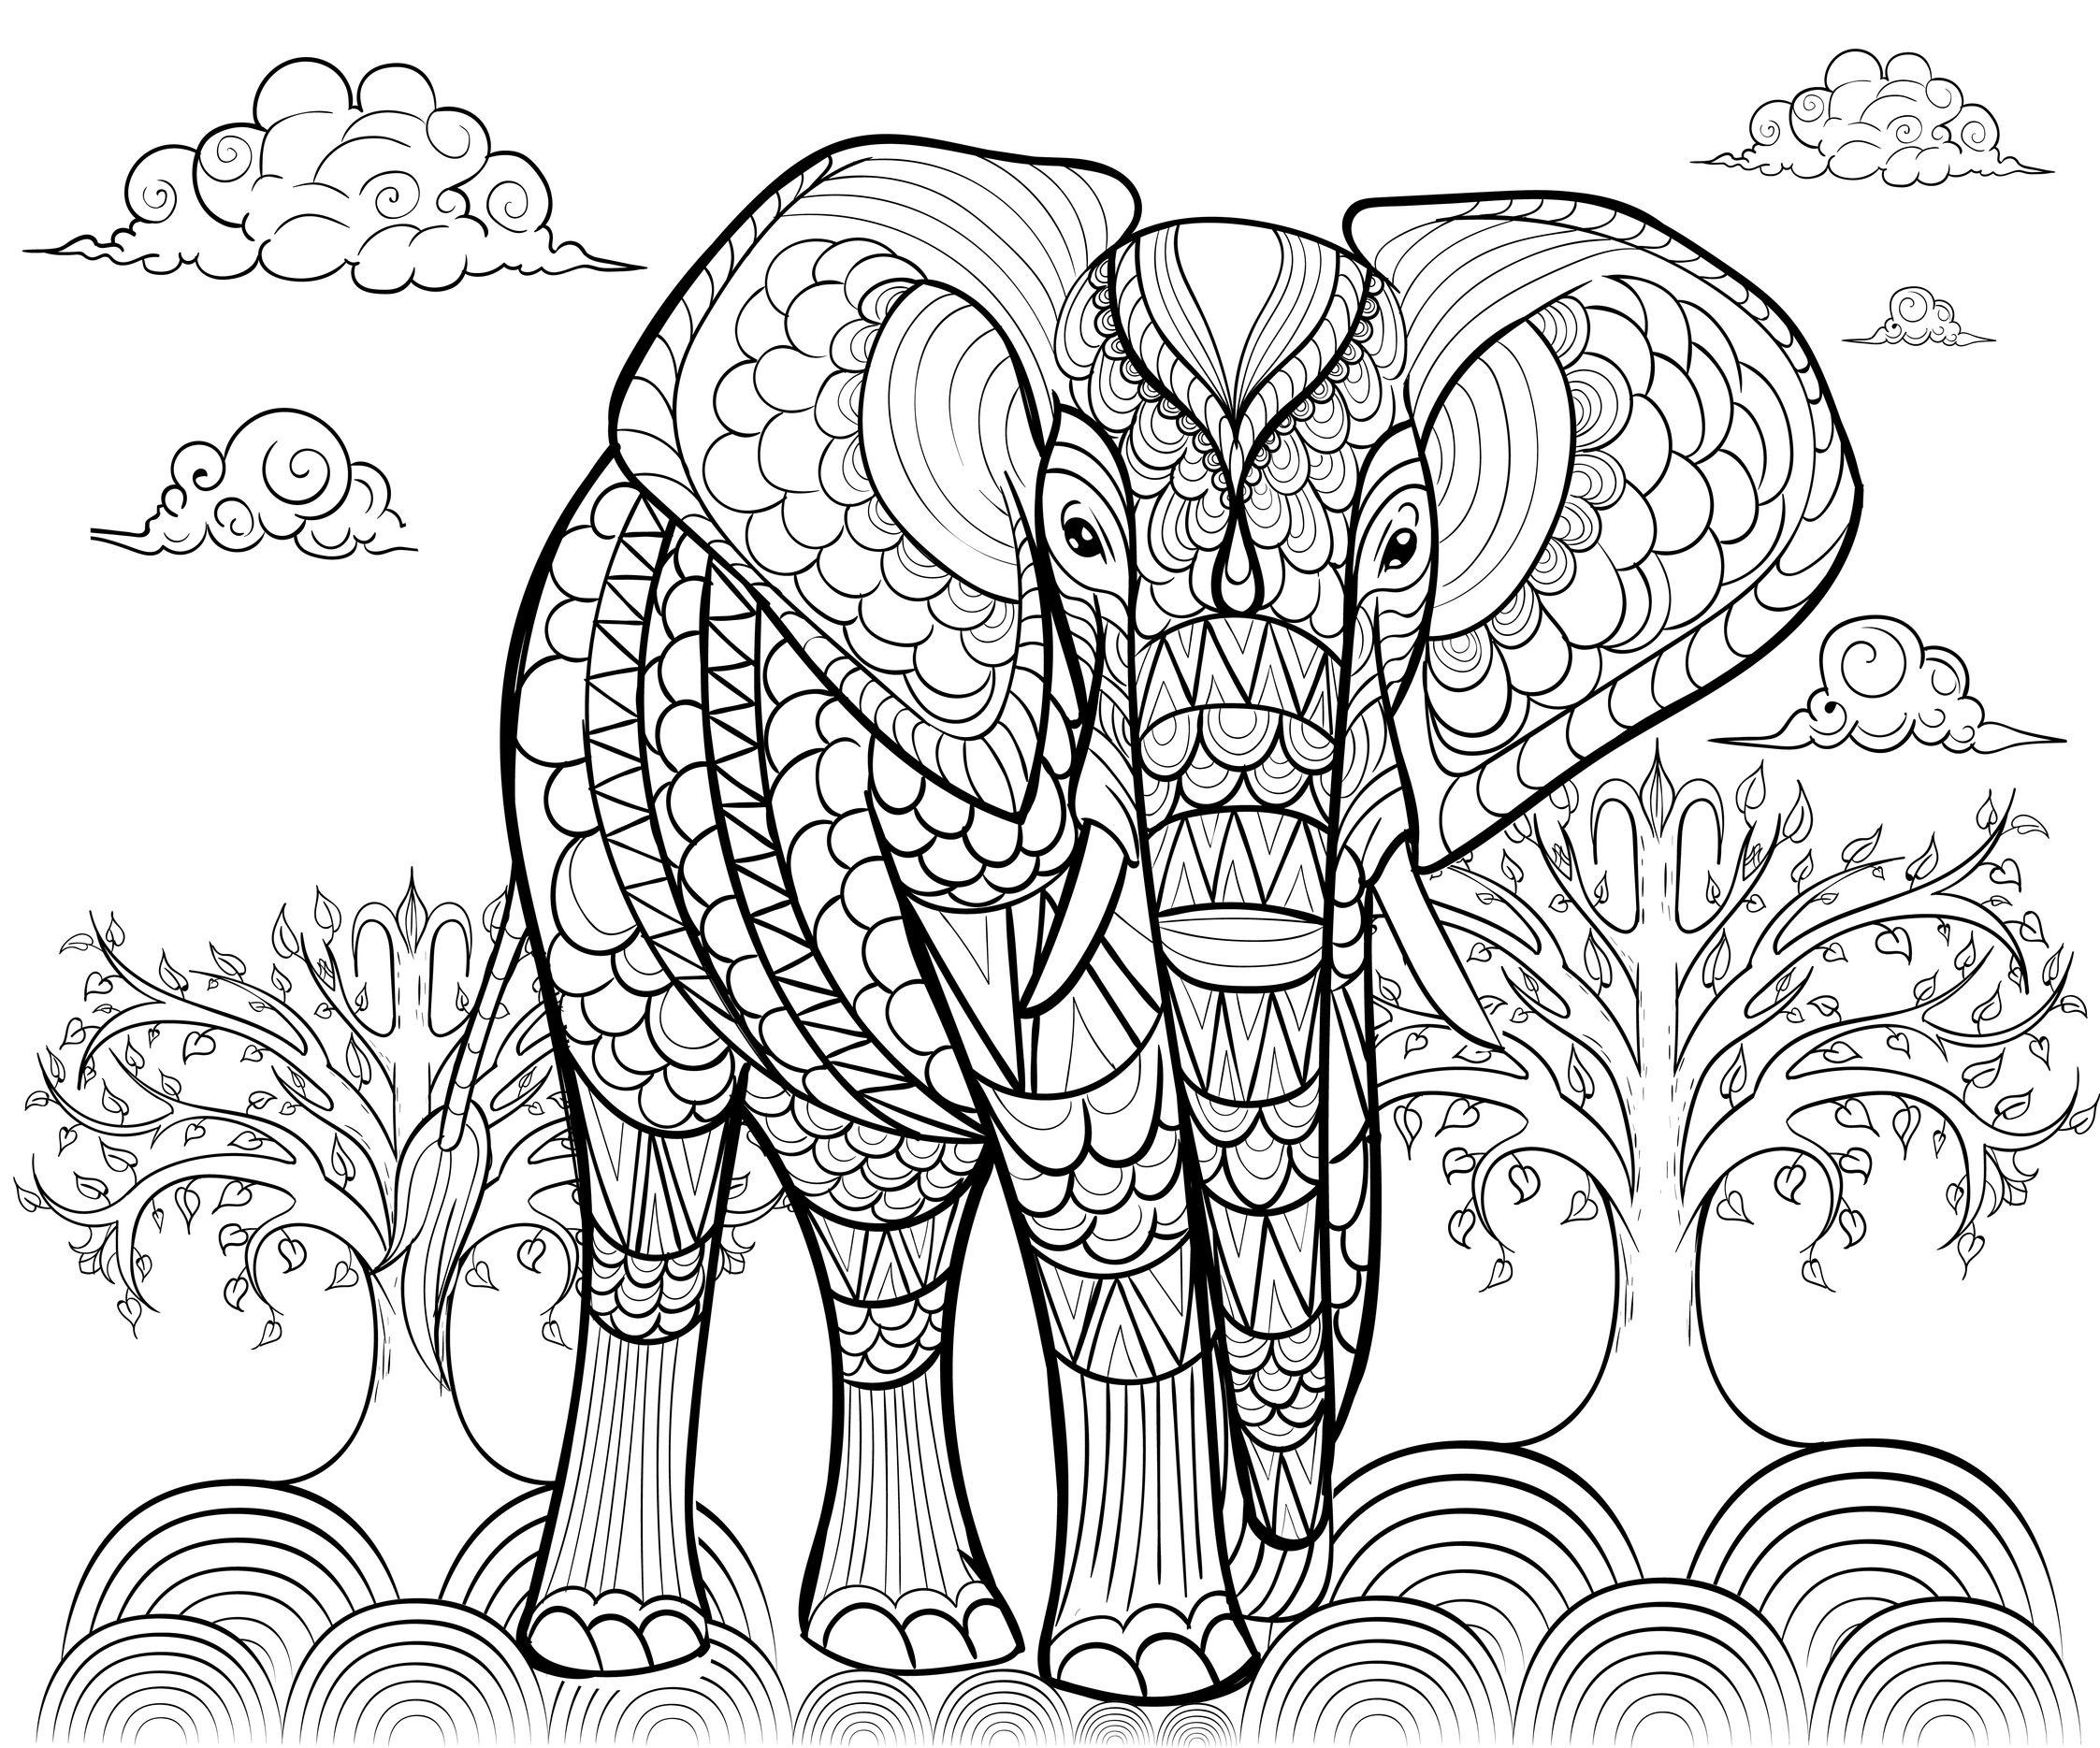 Elephant par alfadanz el phants coloriages difficiles for Disegni da colorare per adulti e ragazzi